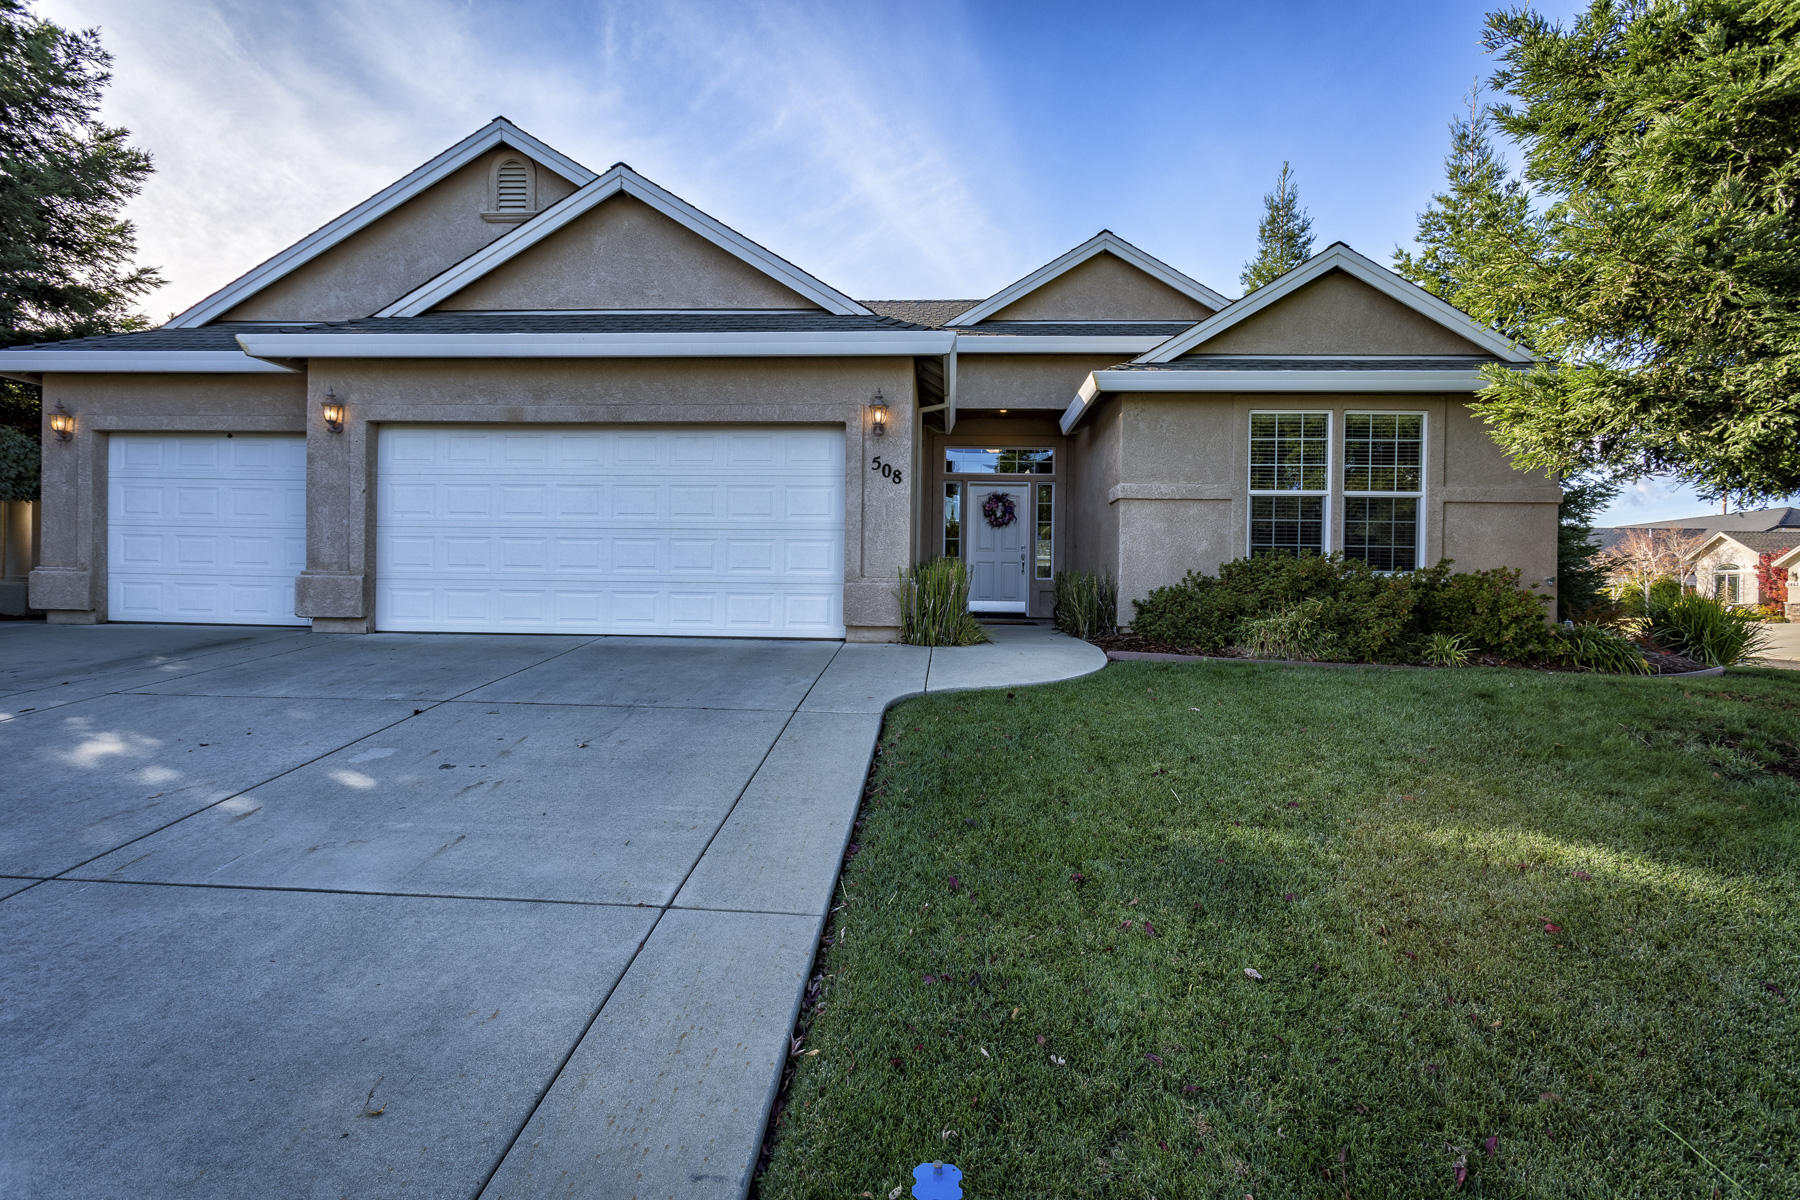 508 Casa Buena St, Redding, CA 96003